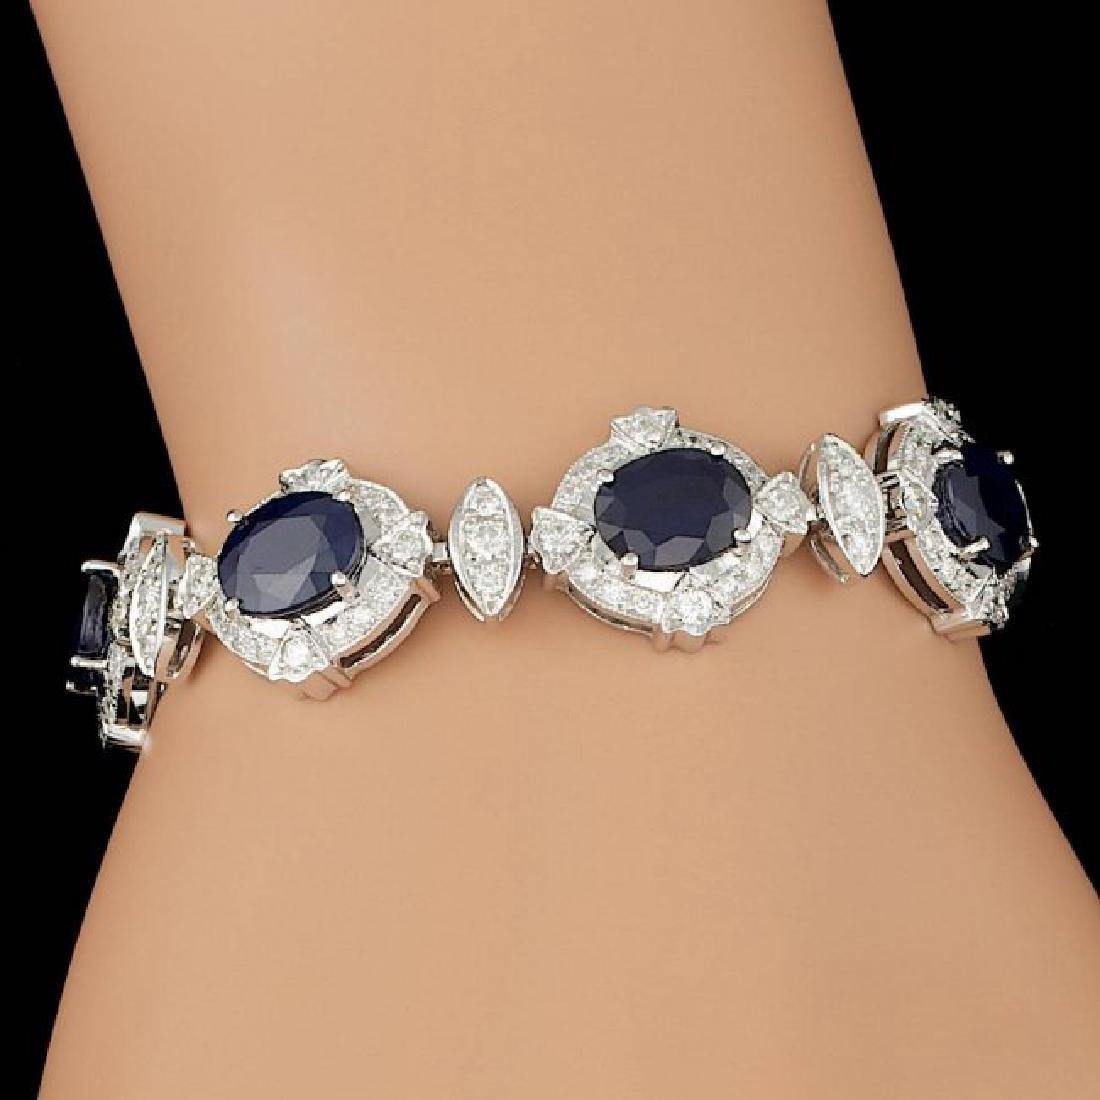 14k Gold 24.50ct Sapphire 5.50ct Diamond Bracelet